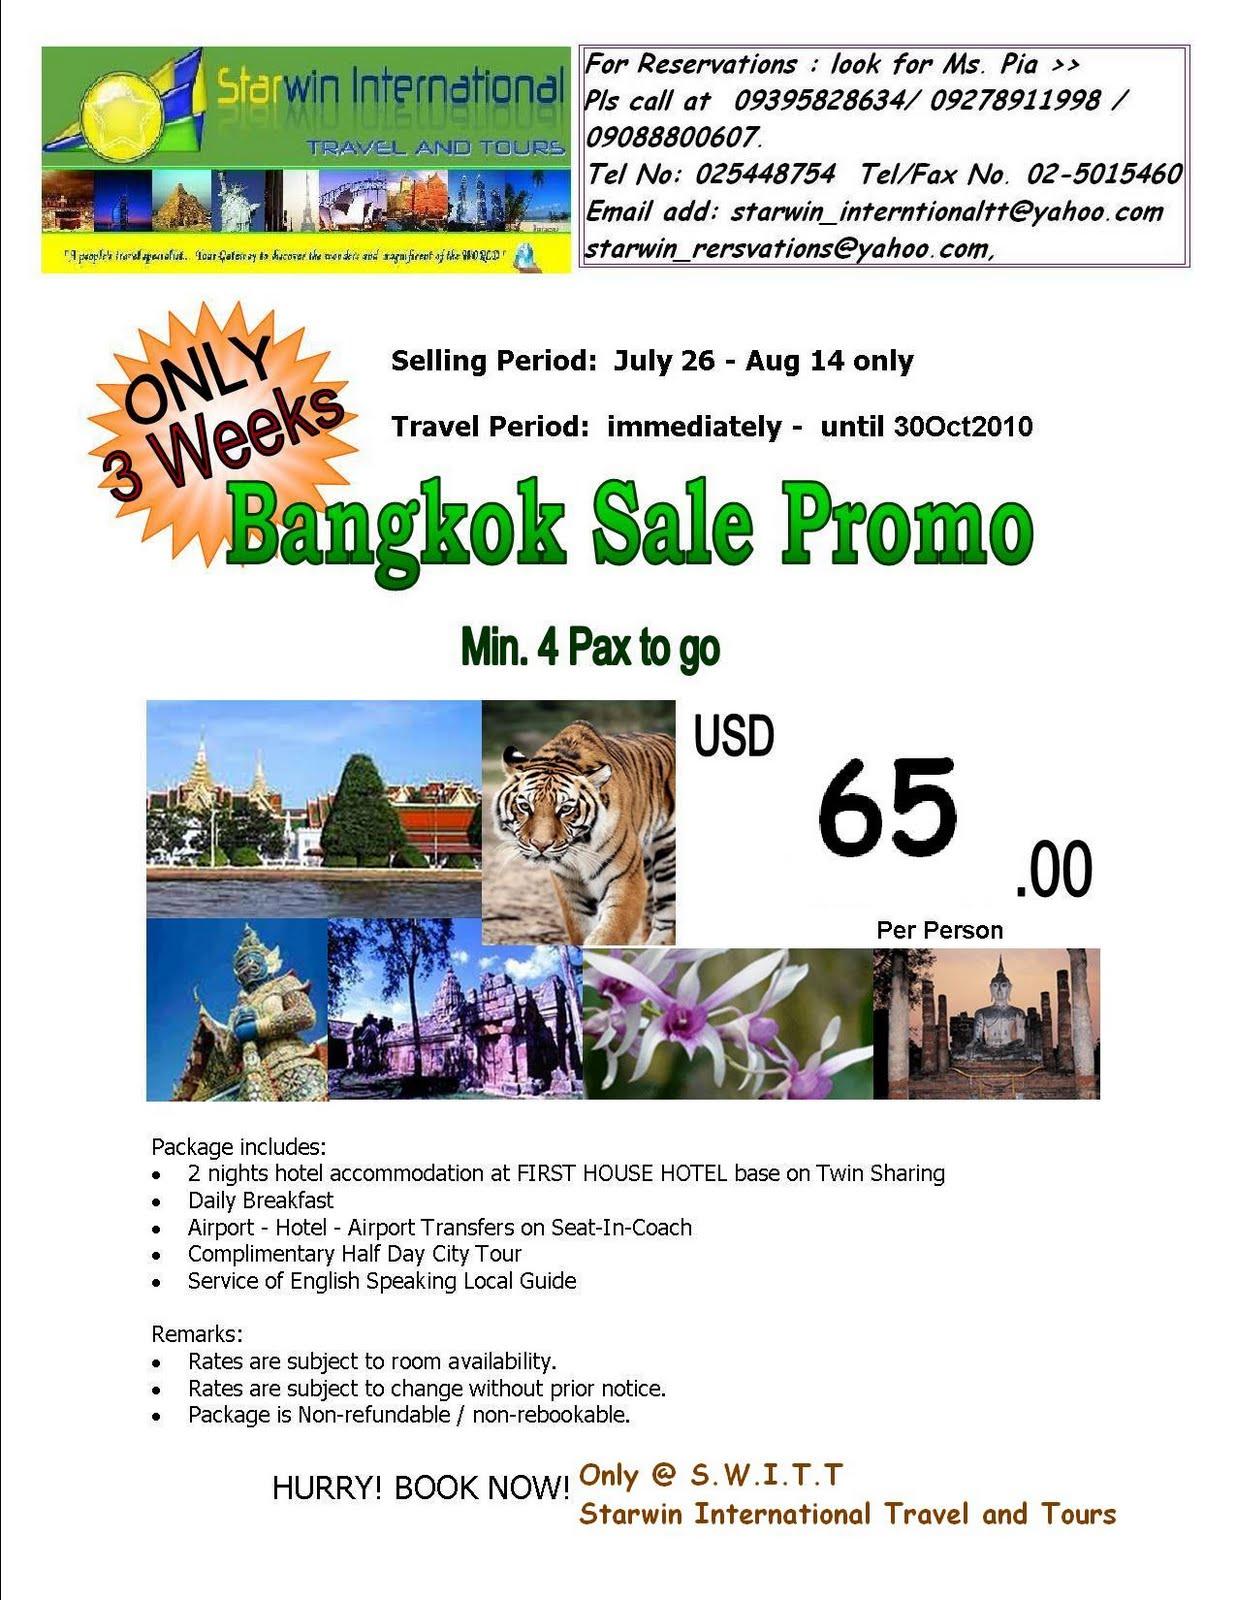 Starwin International Travel And Tours Bangkok Land Arrangement Package Sale Promo